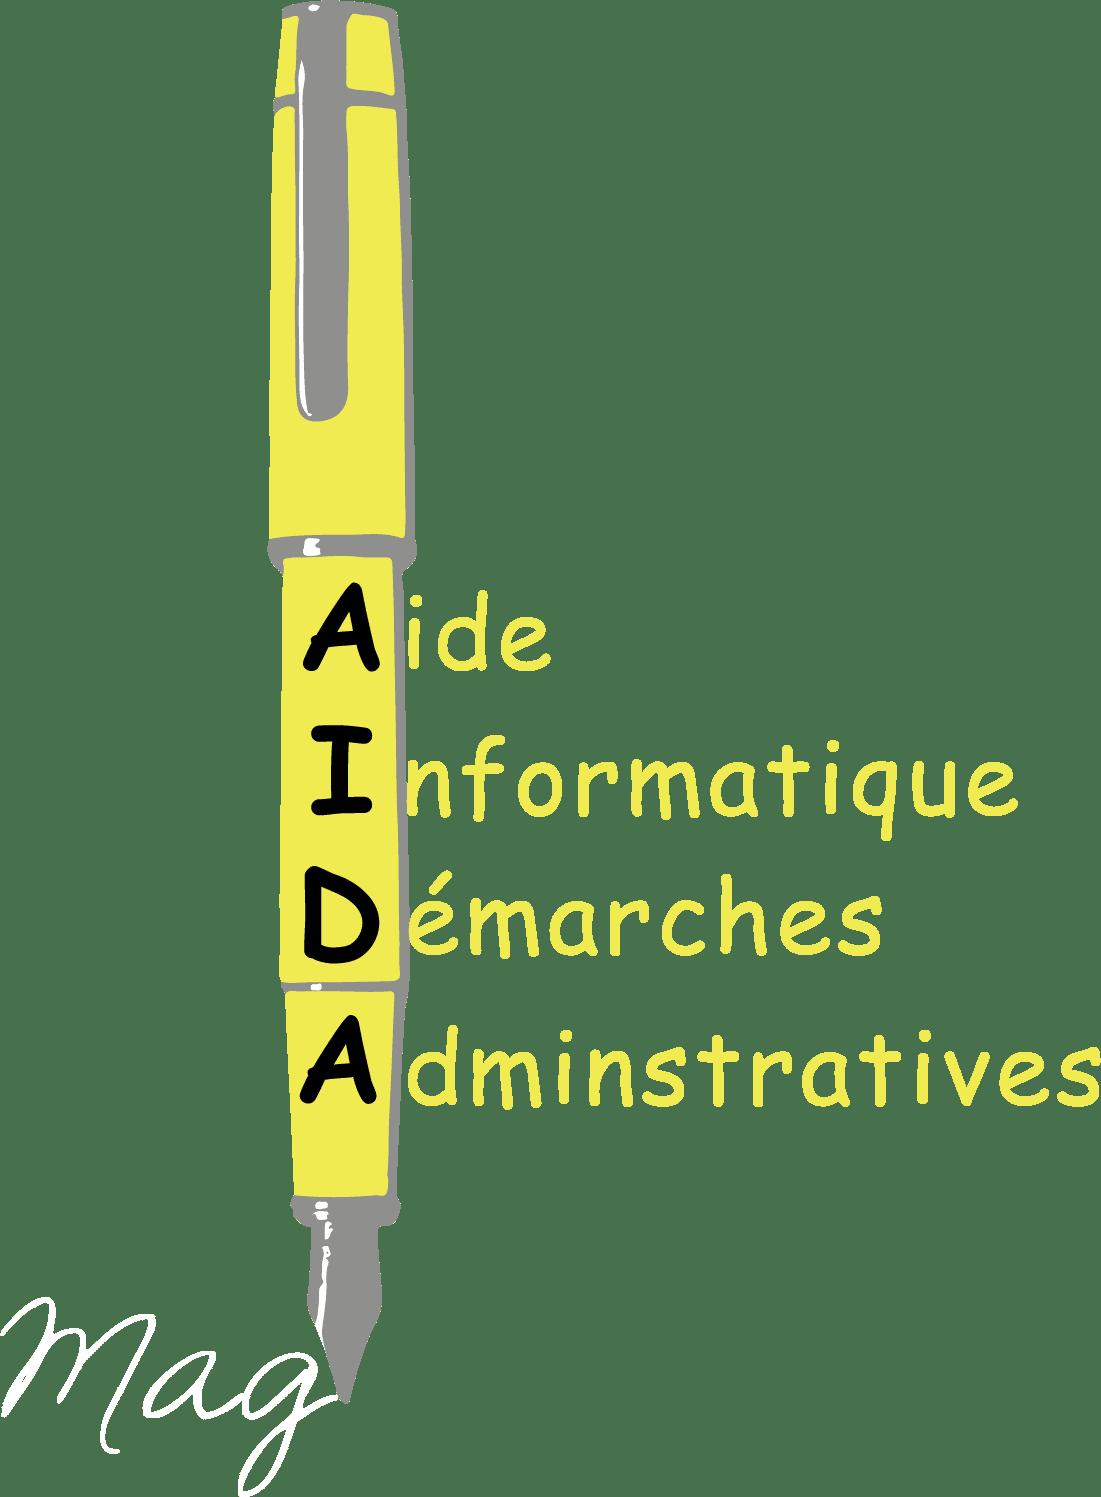 logo_aida_jaune